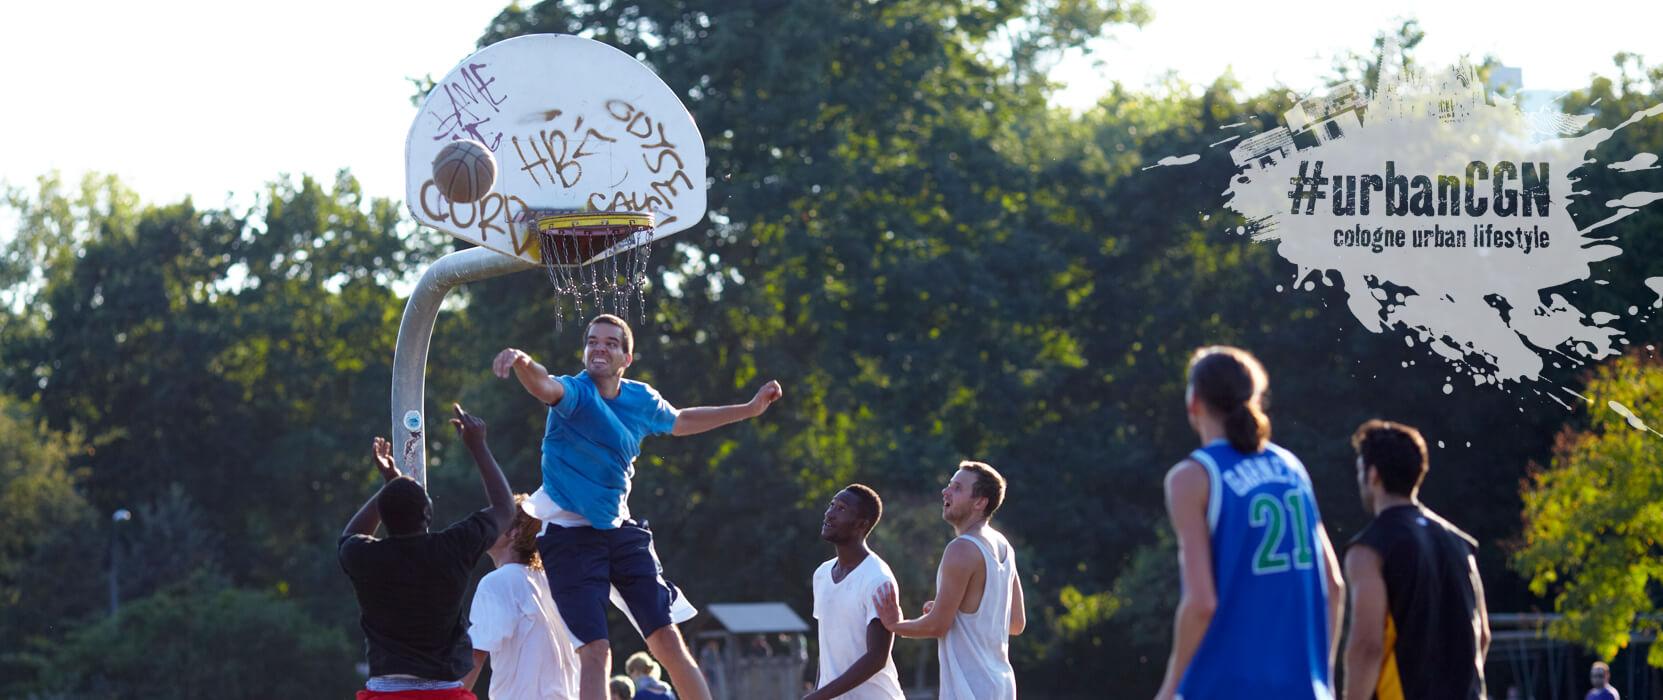 Aachener Weiher, Basketball ©KölnTourismus GmbH, Dieter Jacobi